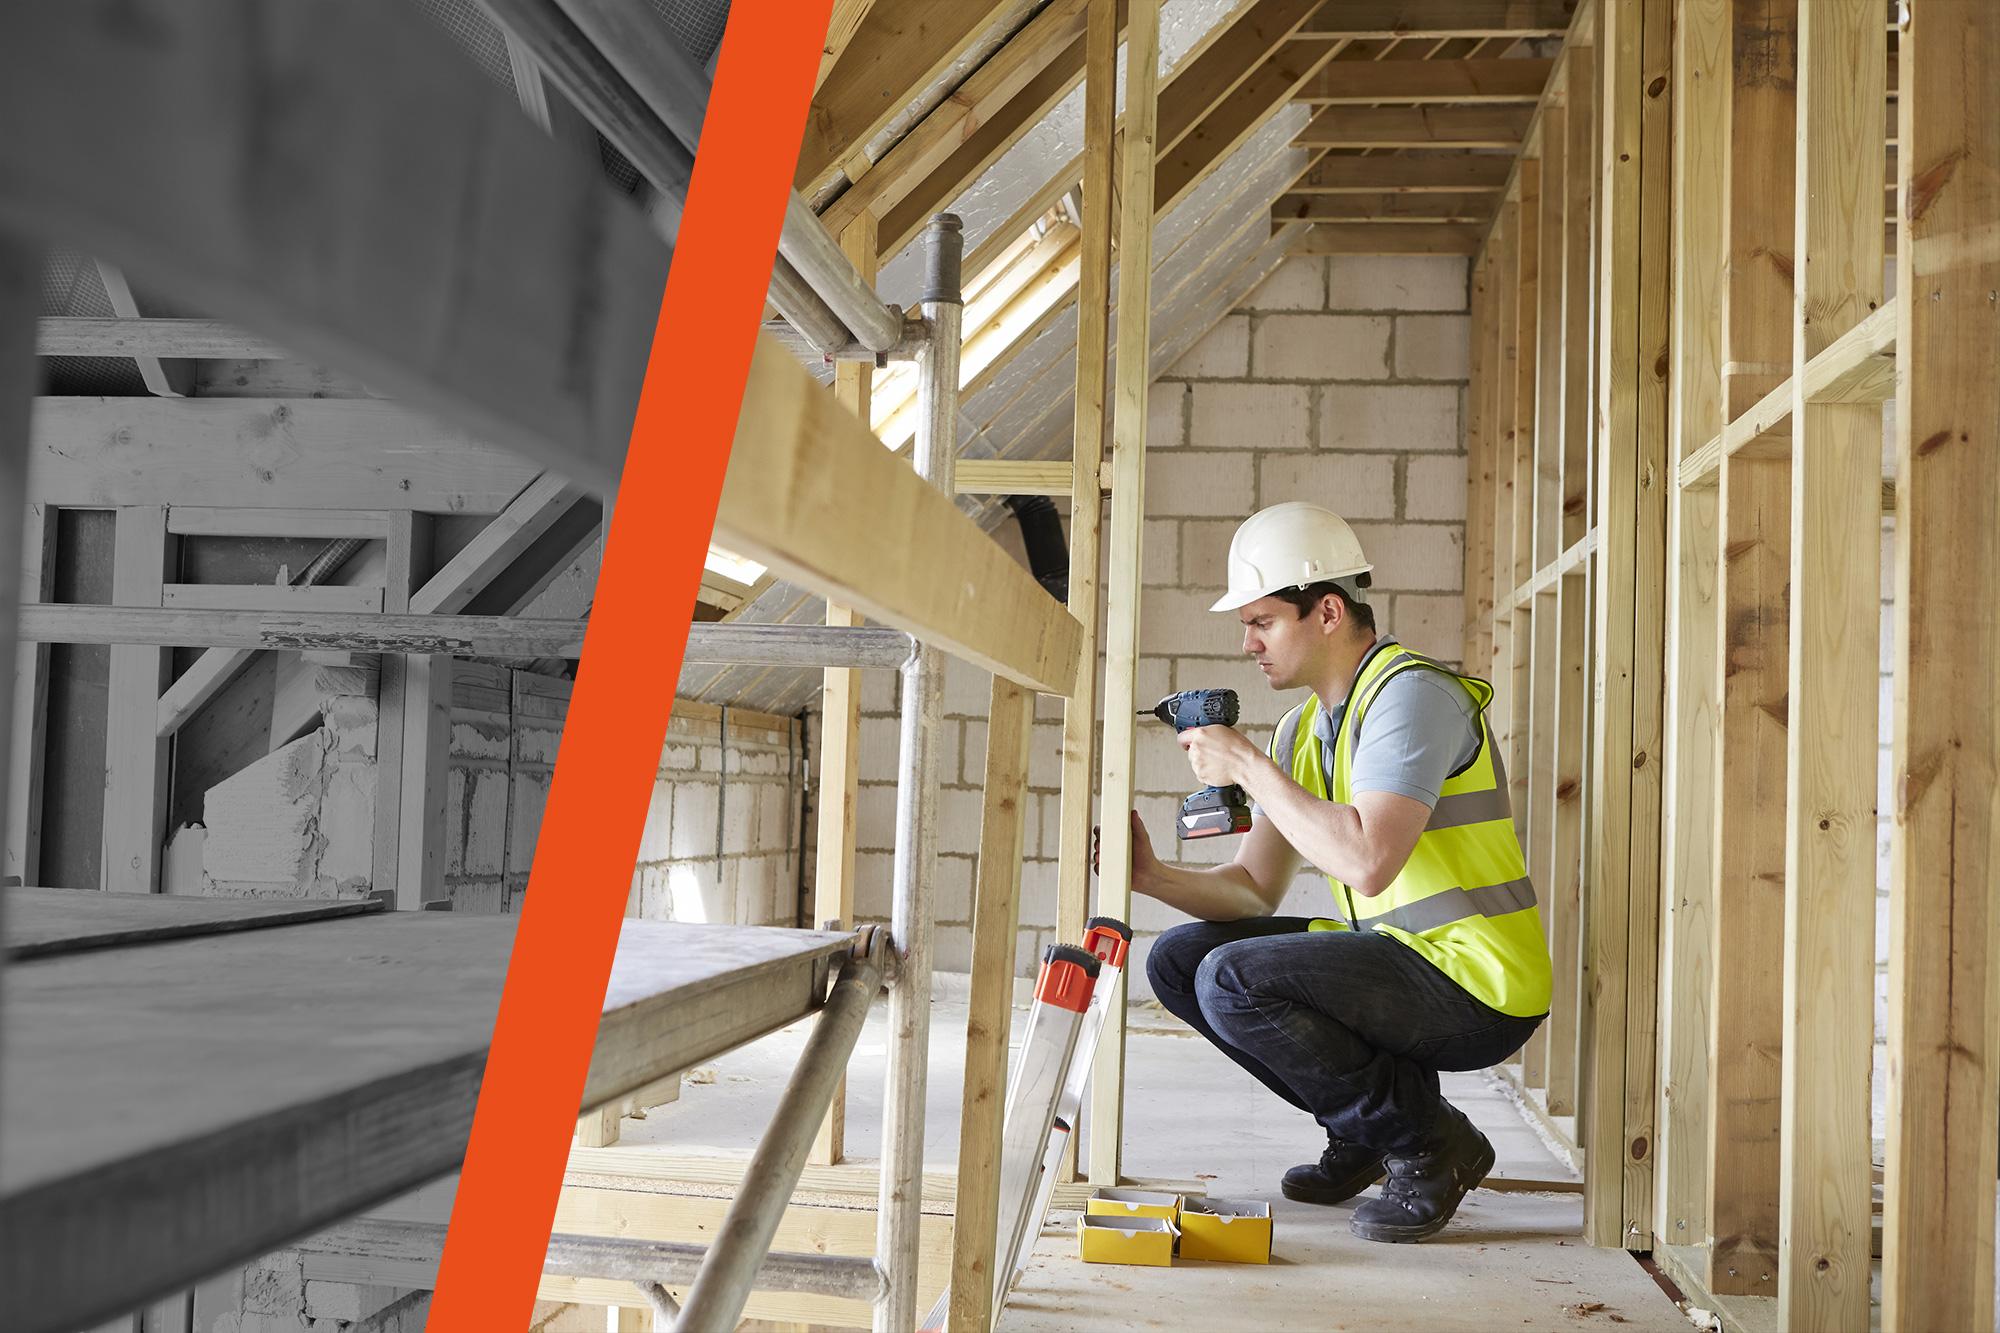 bouwscout-header-worker